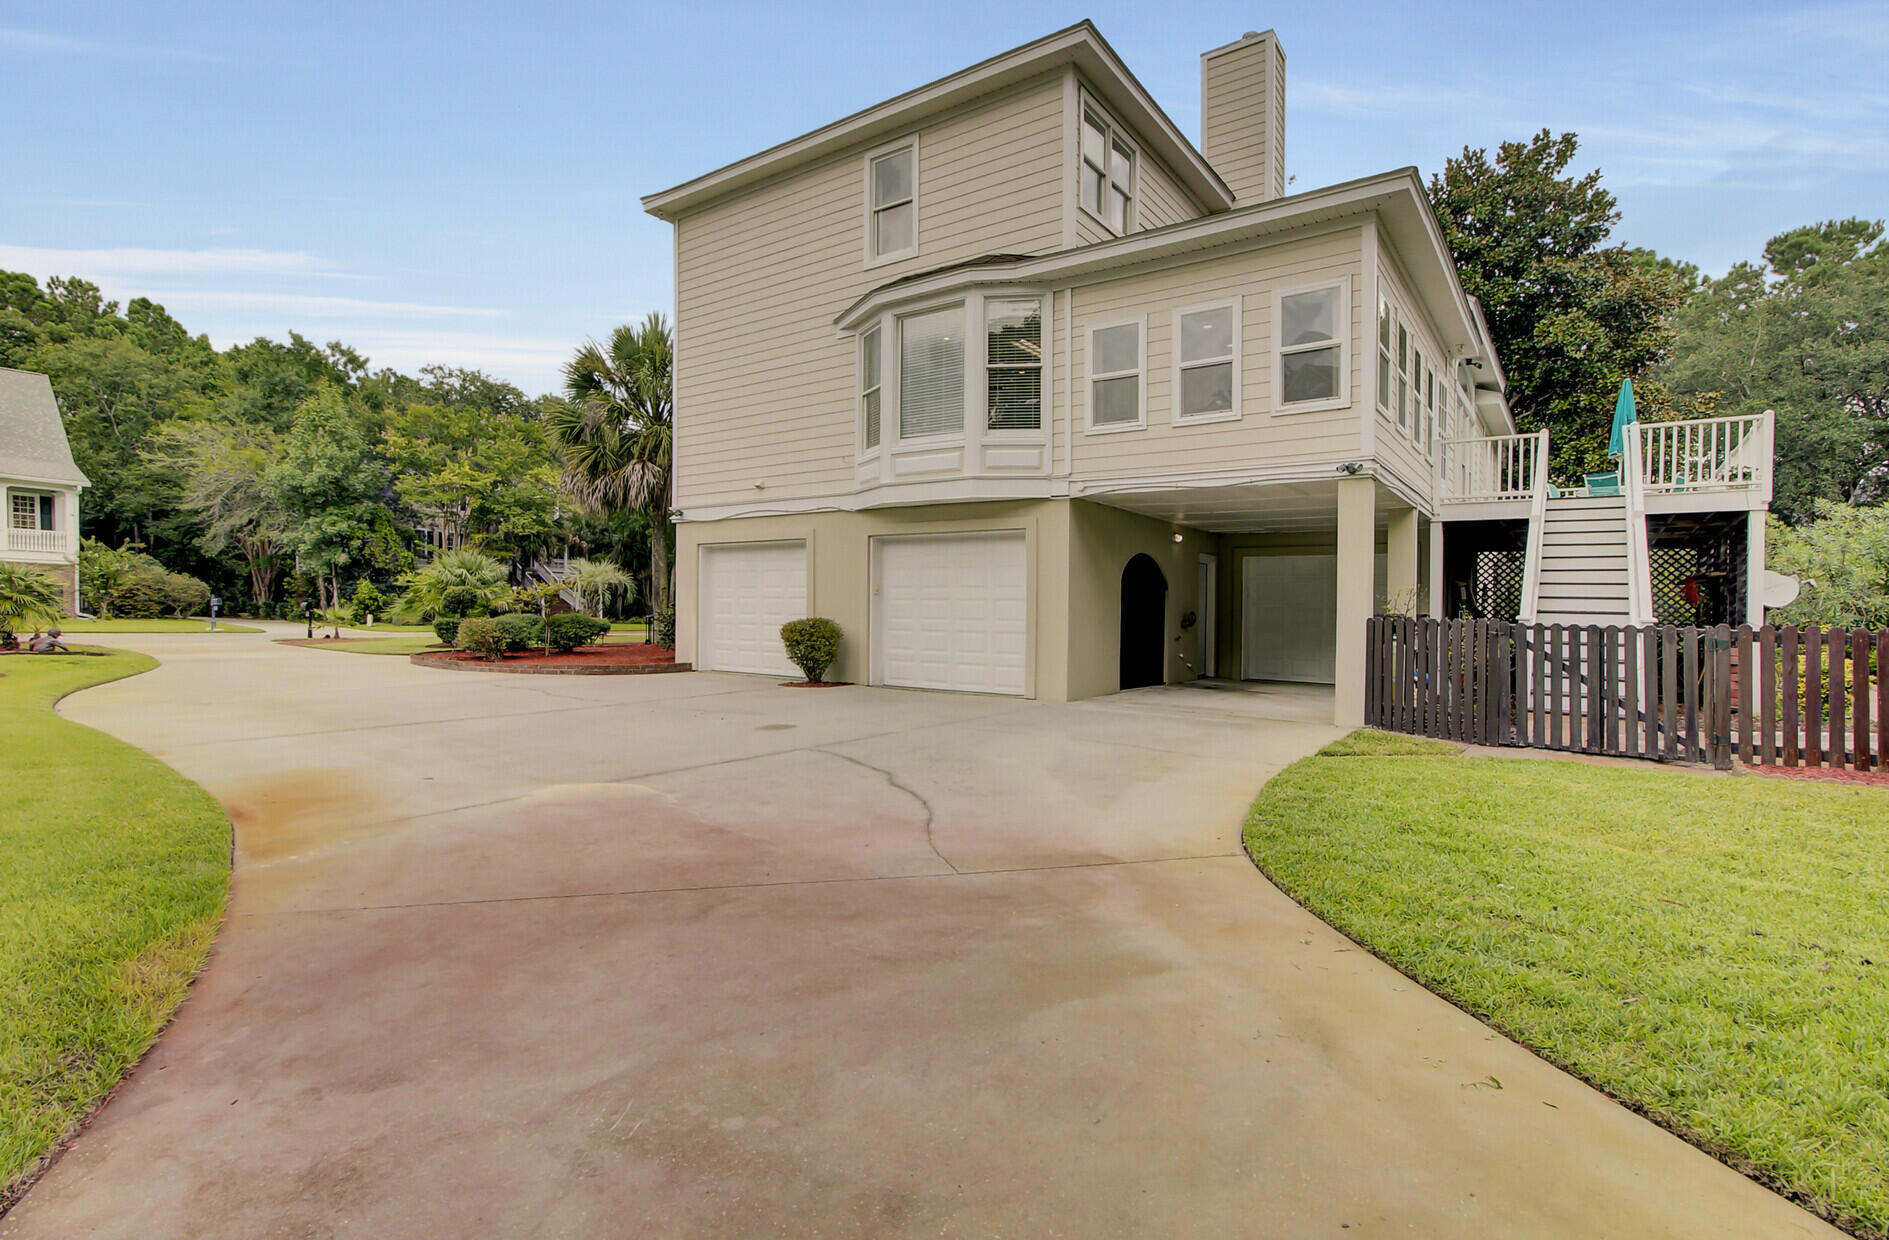 Hamlin Plantation Homes For Sale - 3226 Sand Marsh, Mount Pleasant, SC - 0